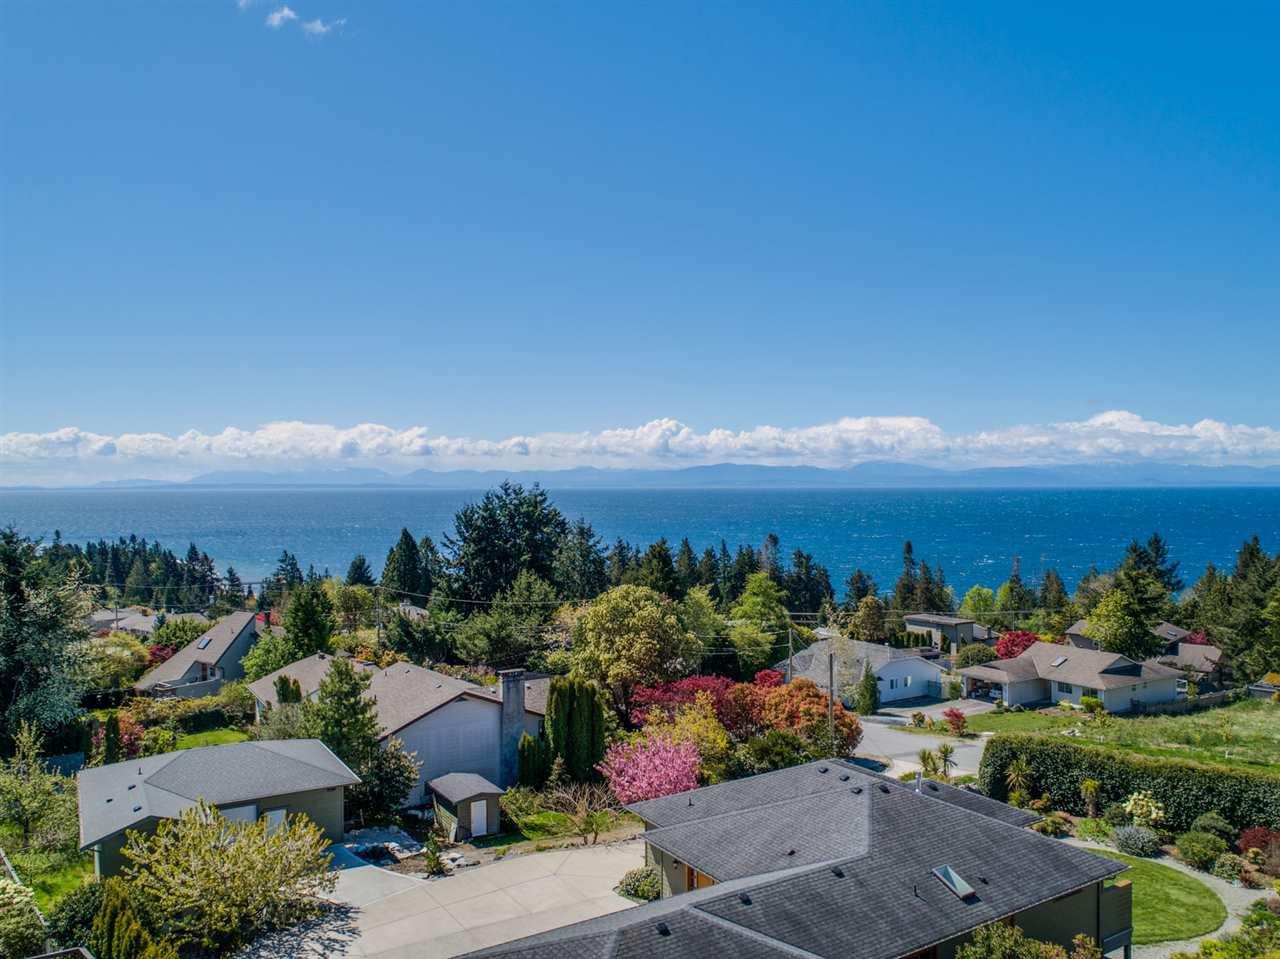 Photo 16: Photos: 4983 ARBUTUS Road in Sechelt: Sechelt District House for sale (Sunshine Coast)  : MLS®# R2427502